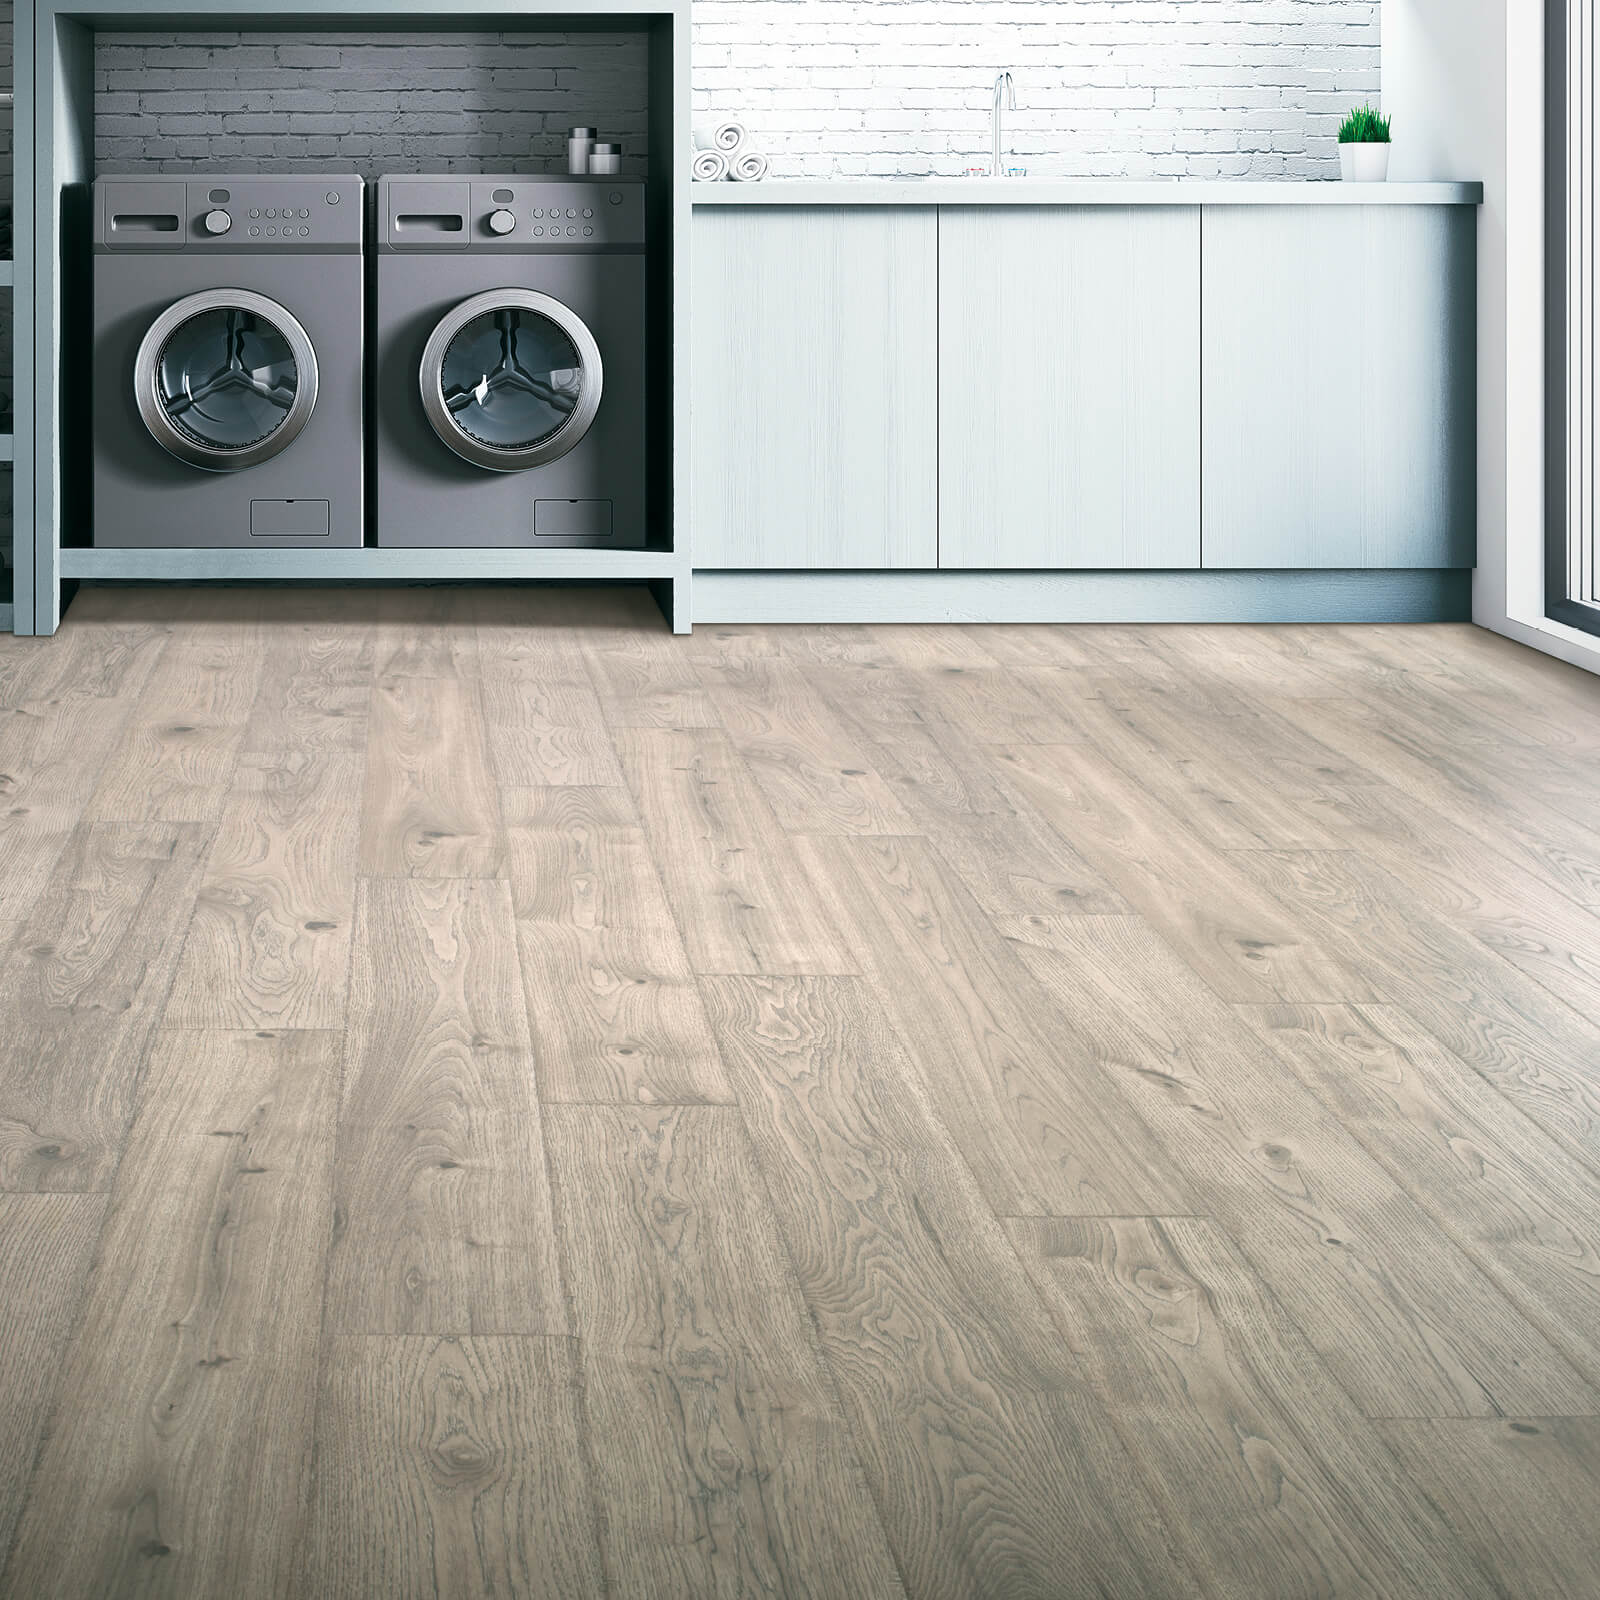 Vinyl Floors in Laundry Room | Haley's Flooring & Interiors